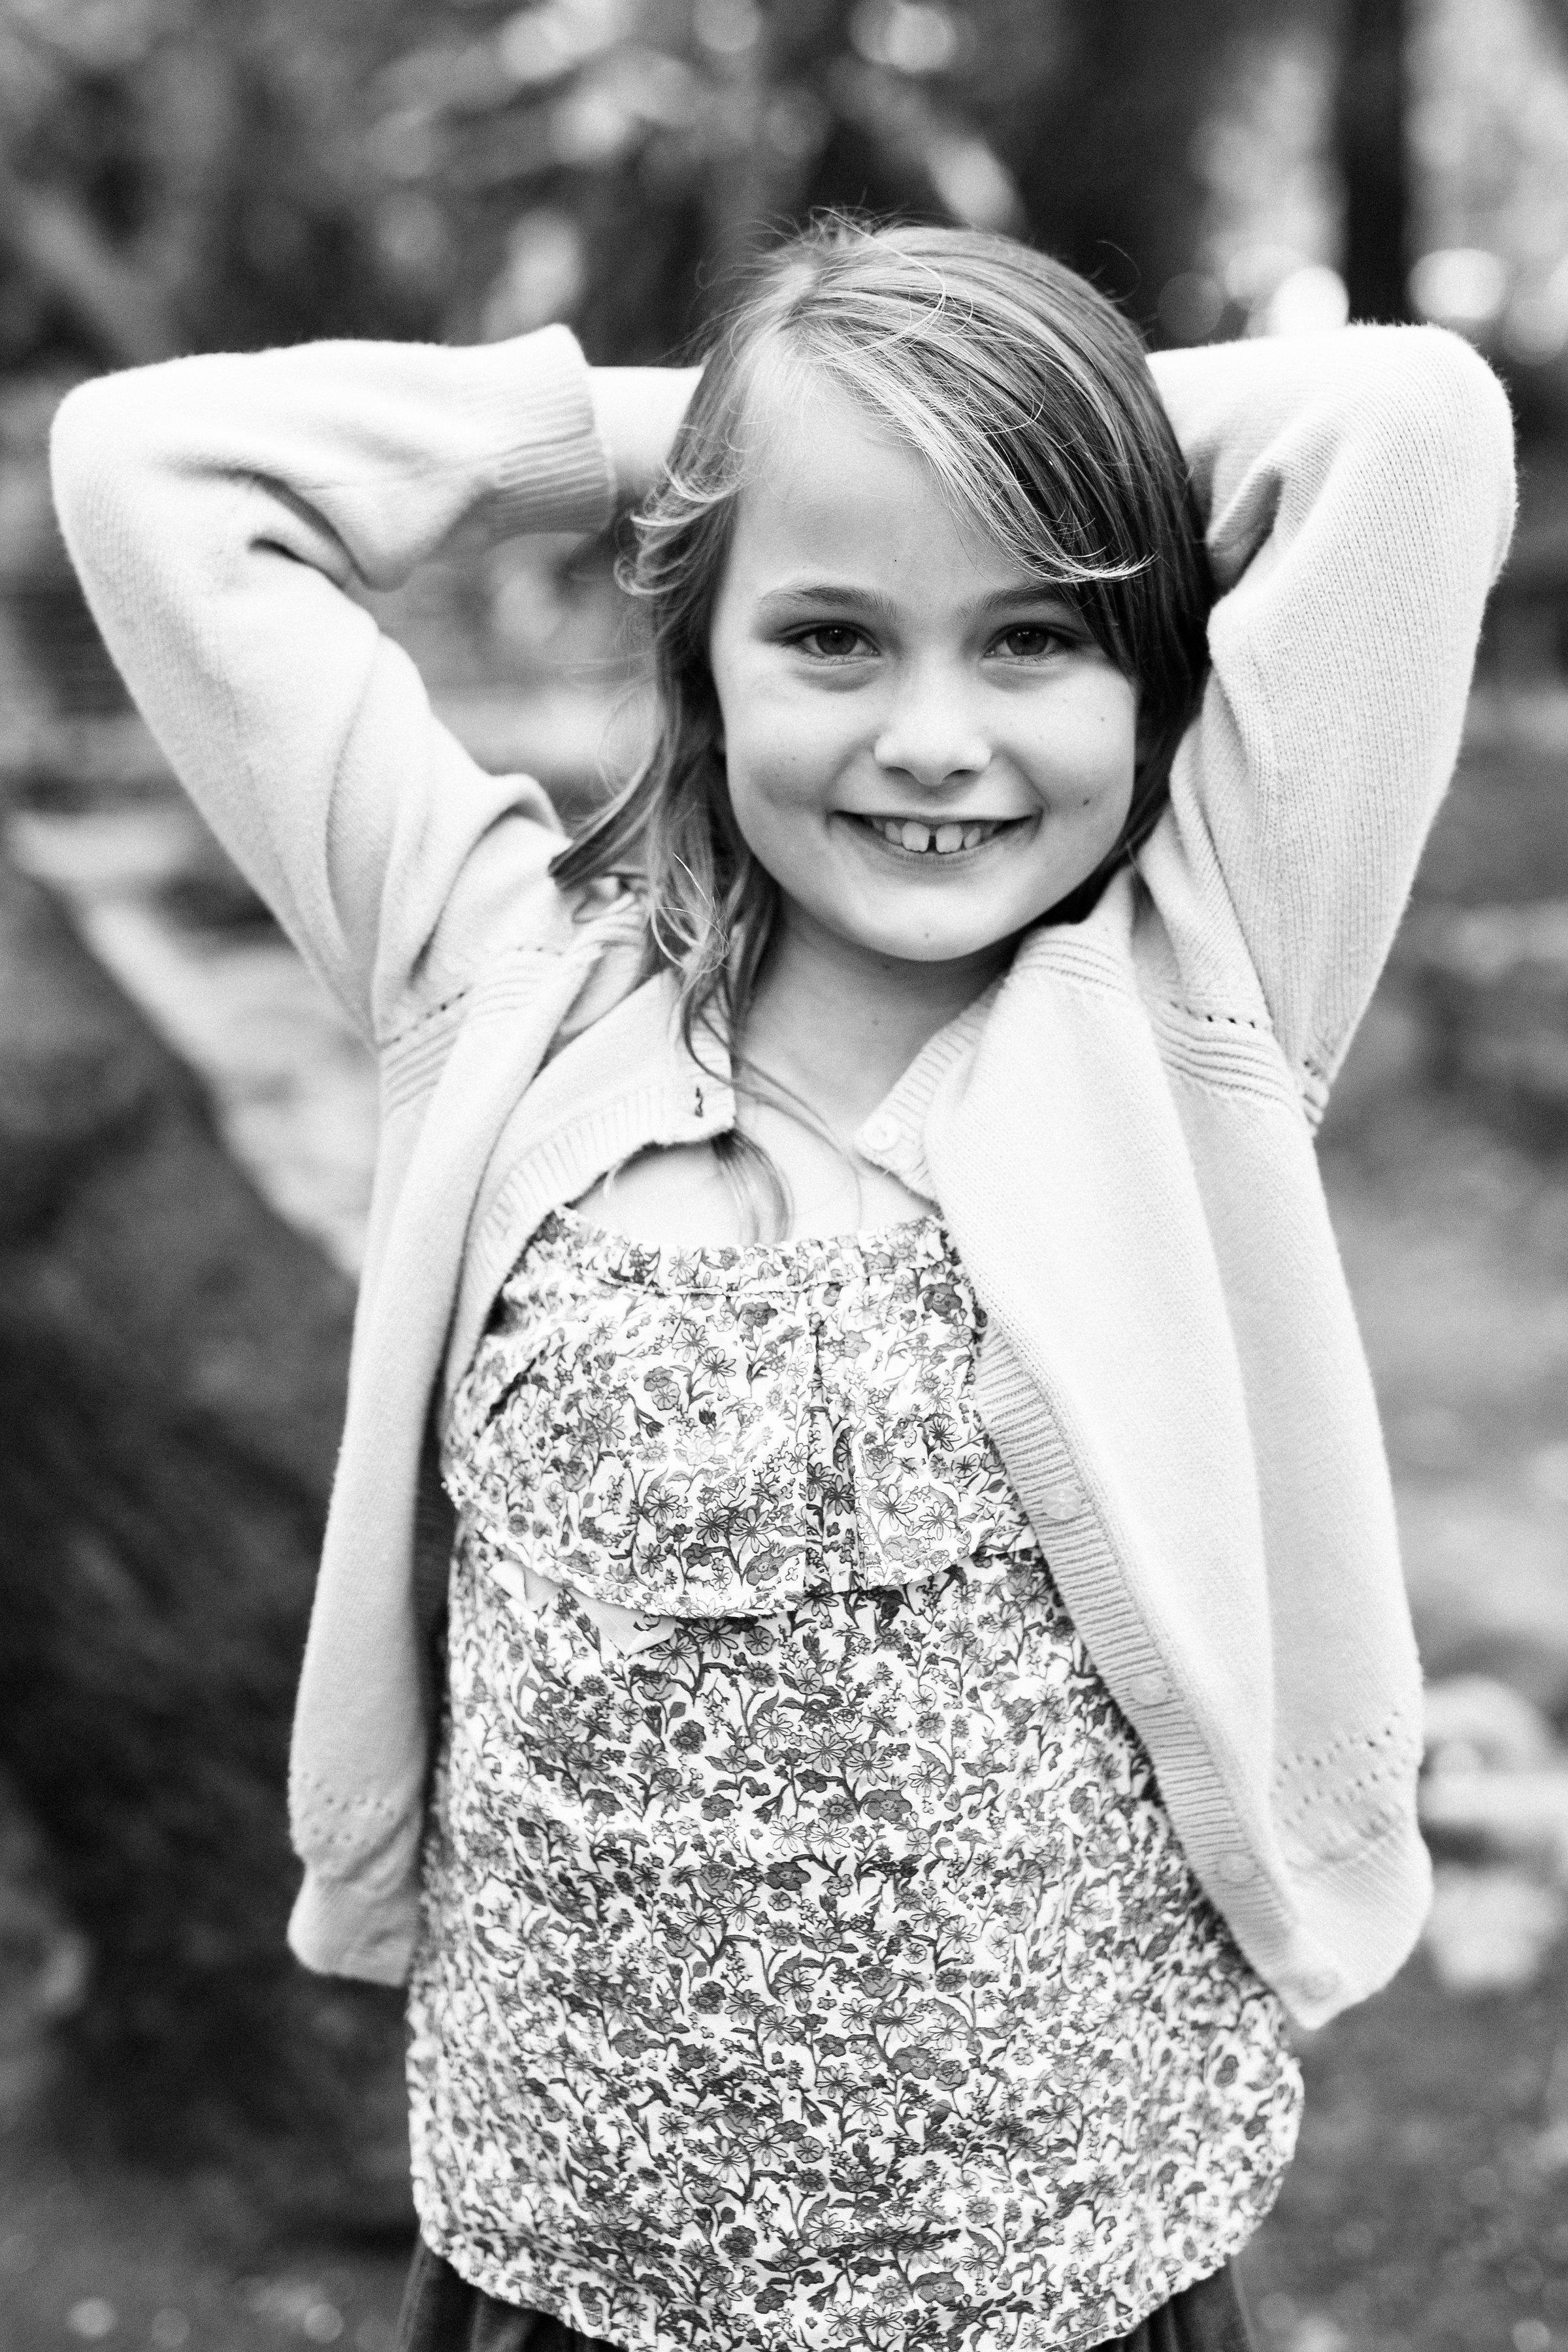 emersons-golden-birthday_nicki-sebastian-photography-185.jpg